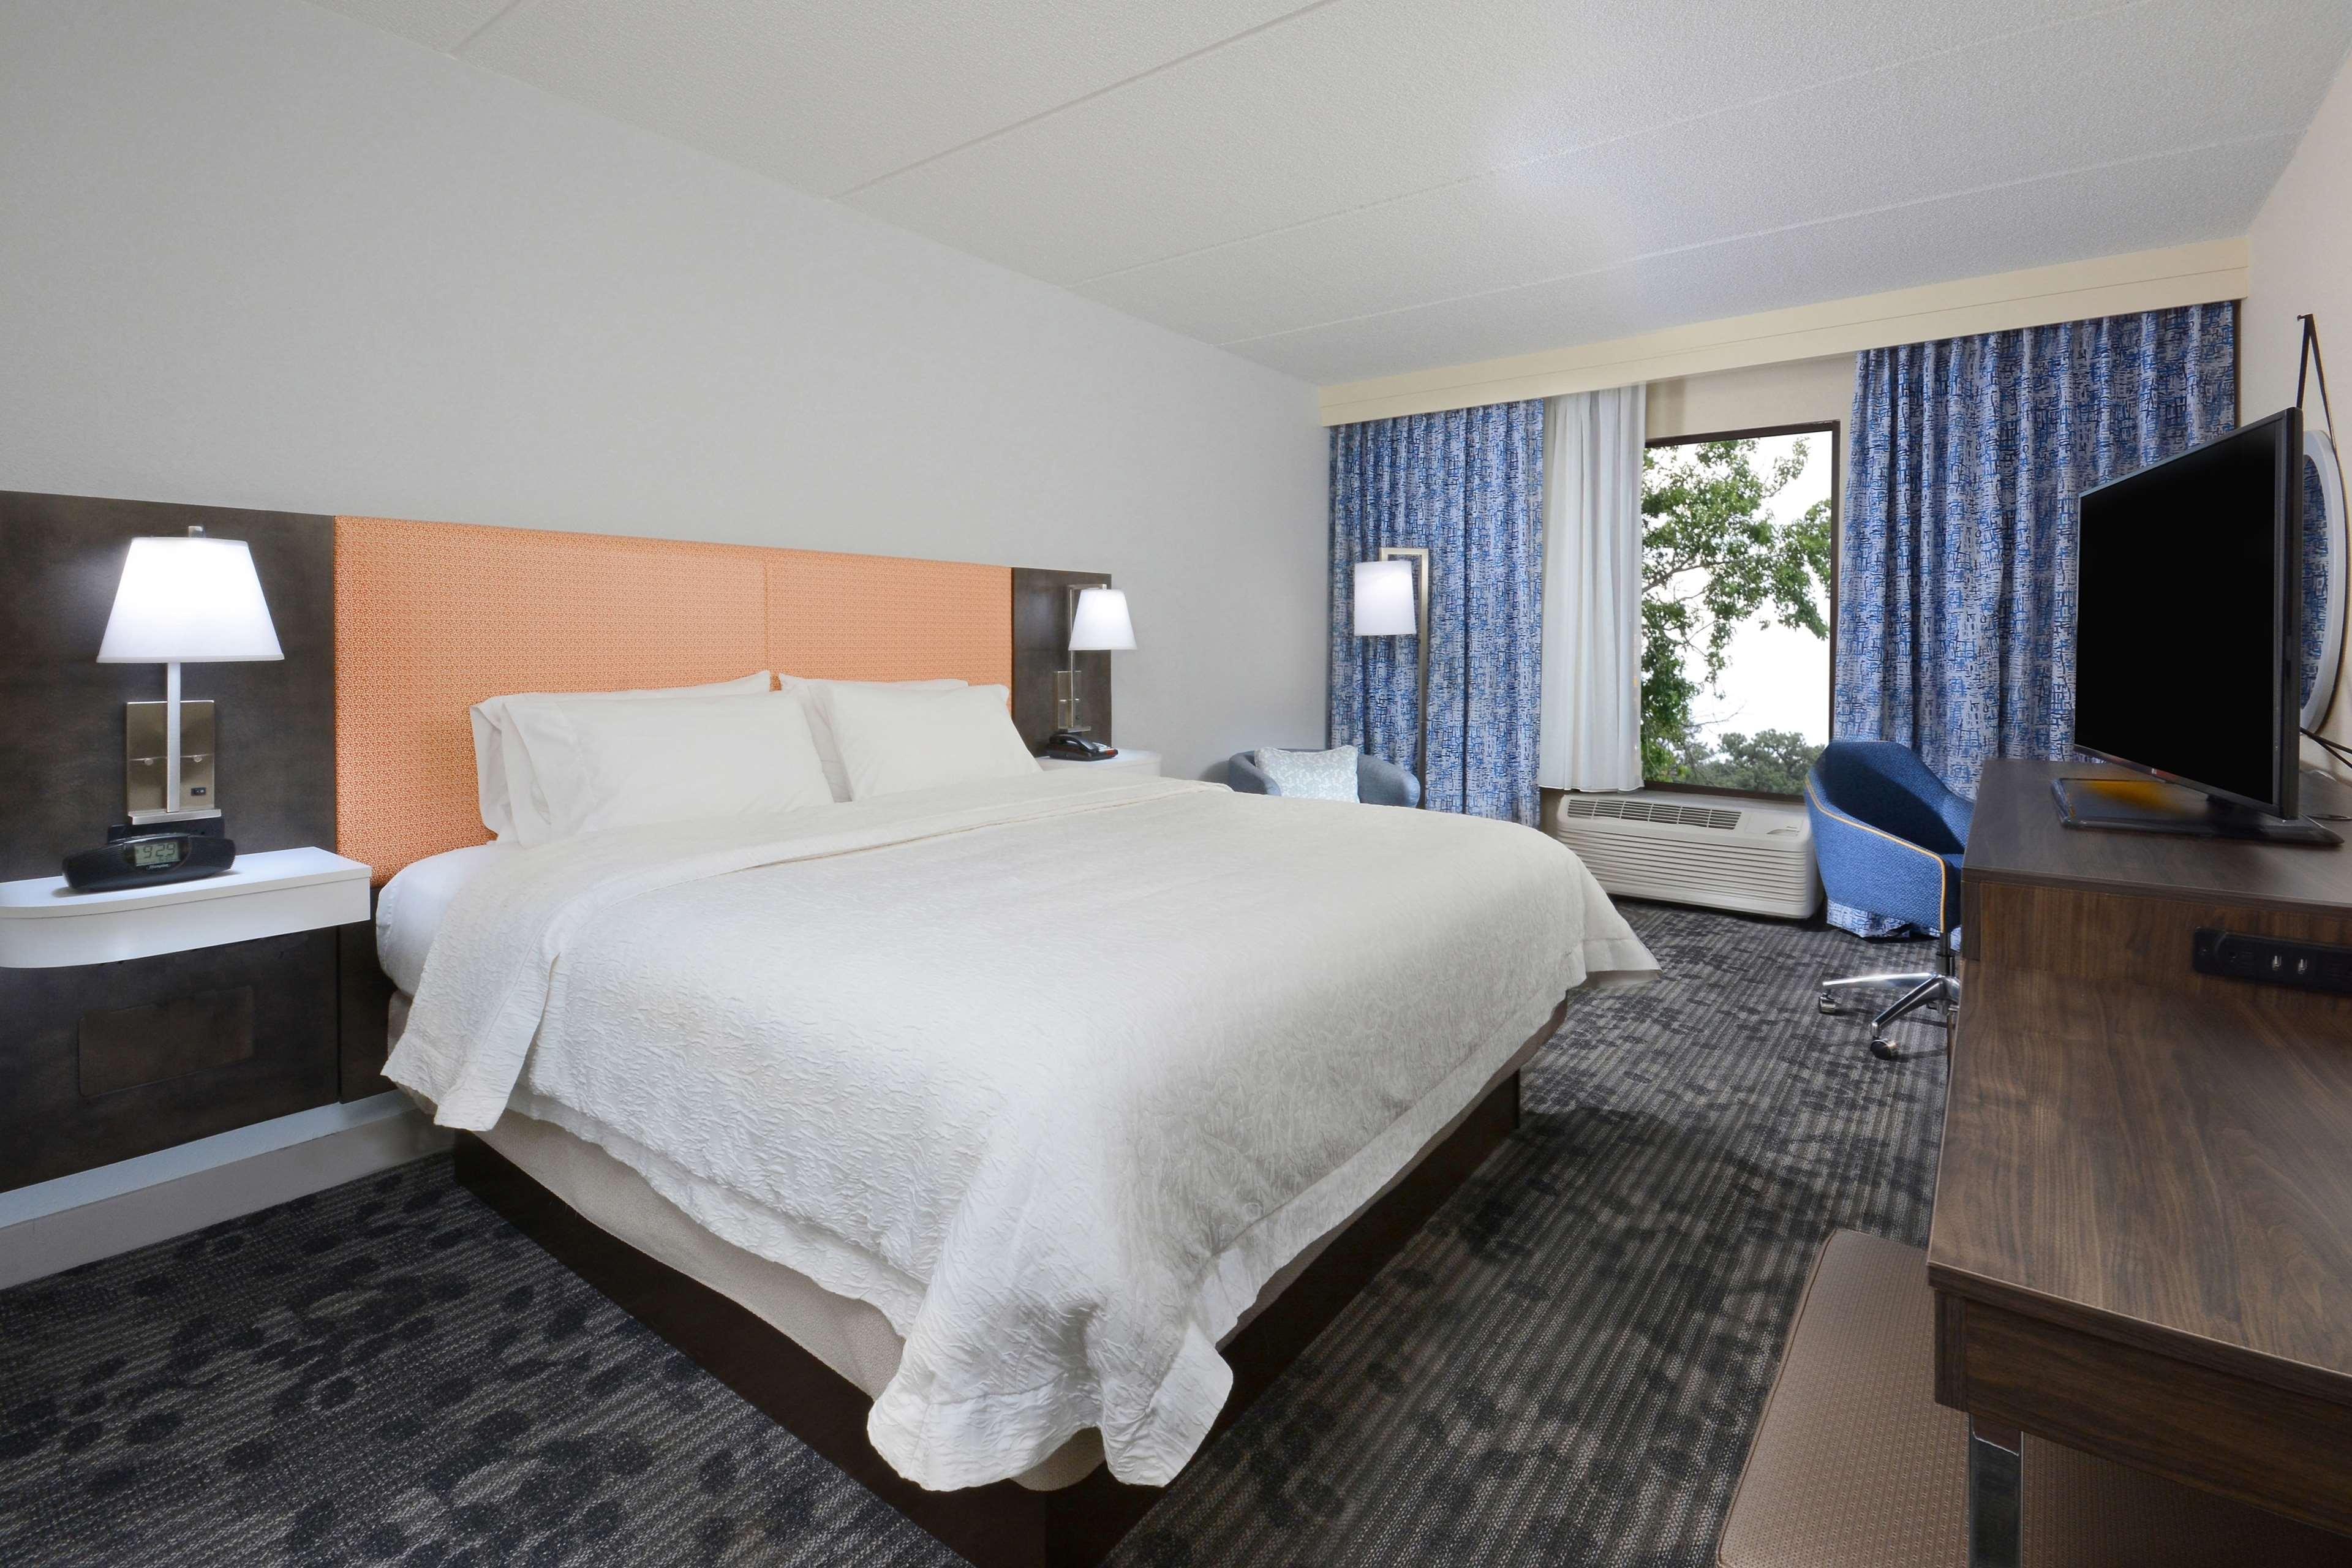 Hampton Inn & Suites Greenville/Spartanburg I-85 image 32